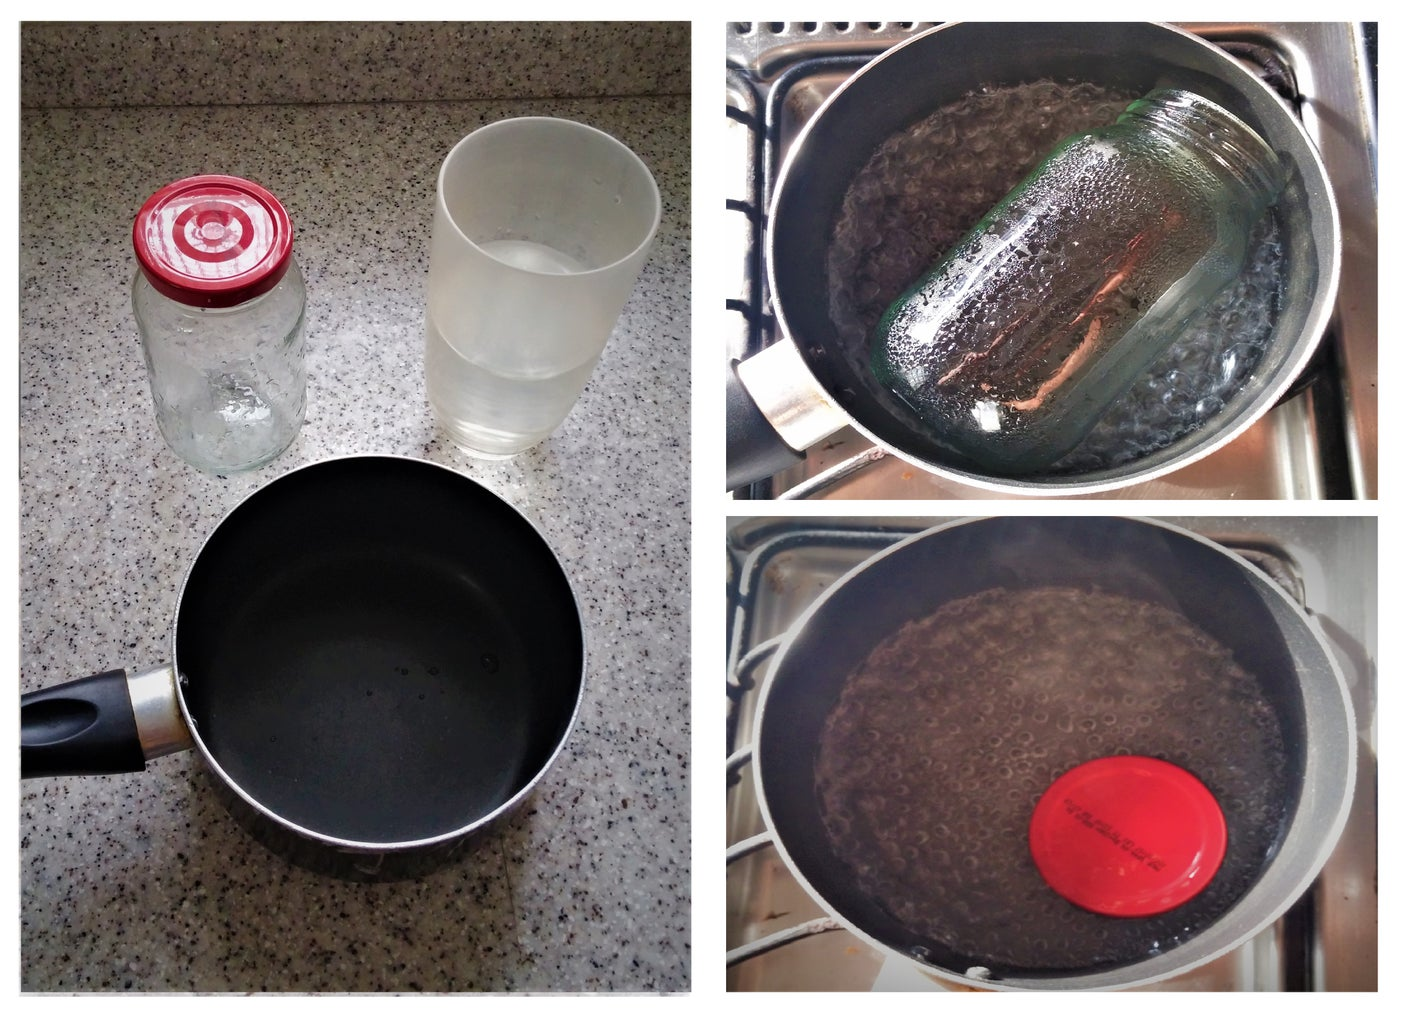 Prepare the Jar (Optional)